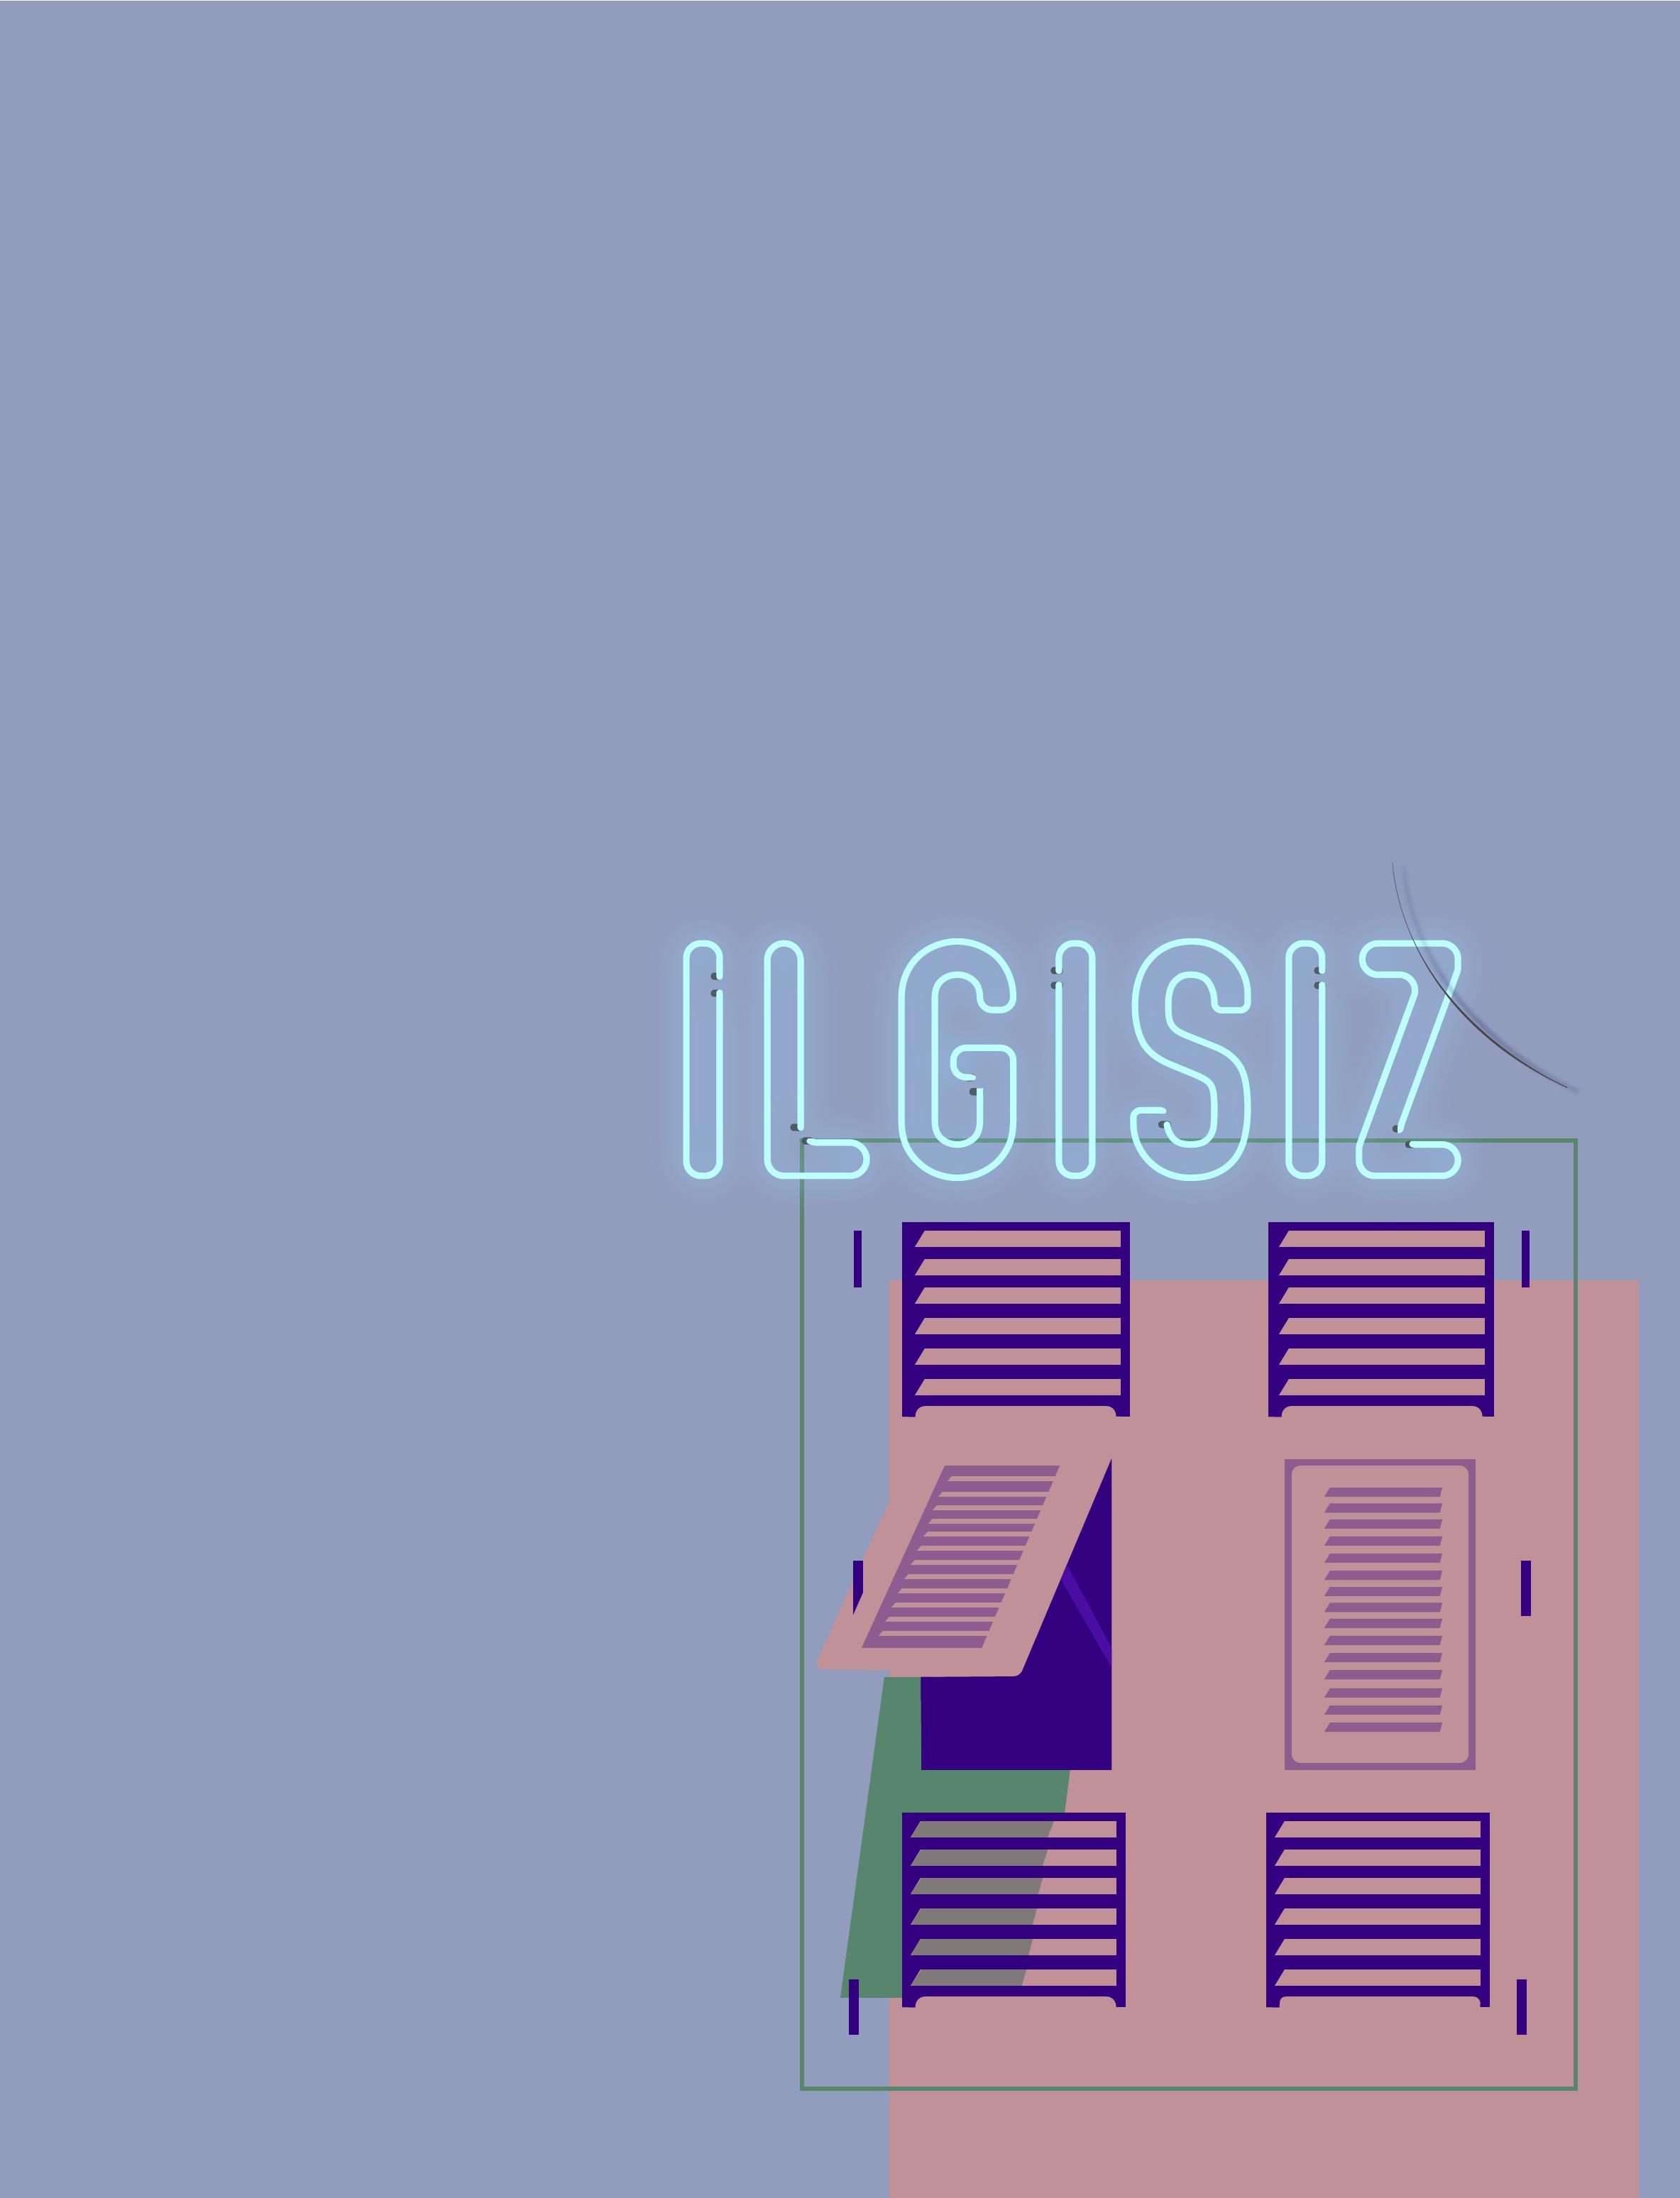 Ilgisiz Poster for BiCeBe - Bolivian Poster Bienniale